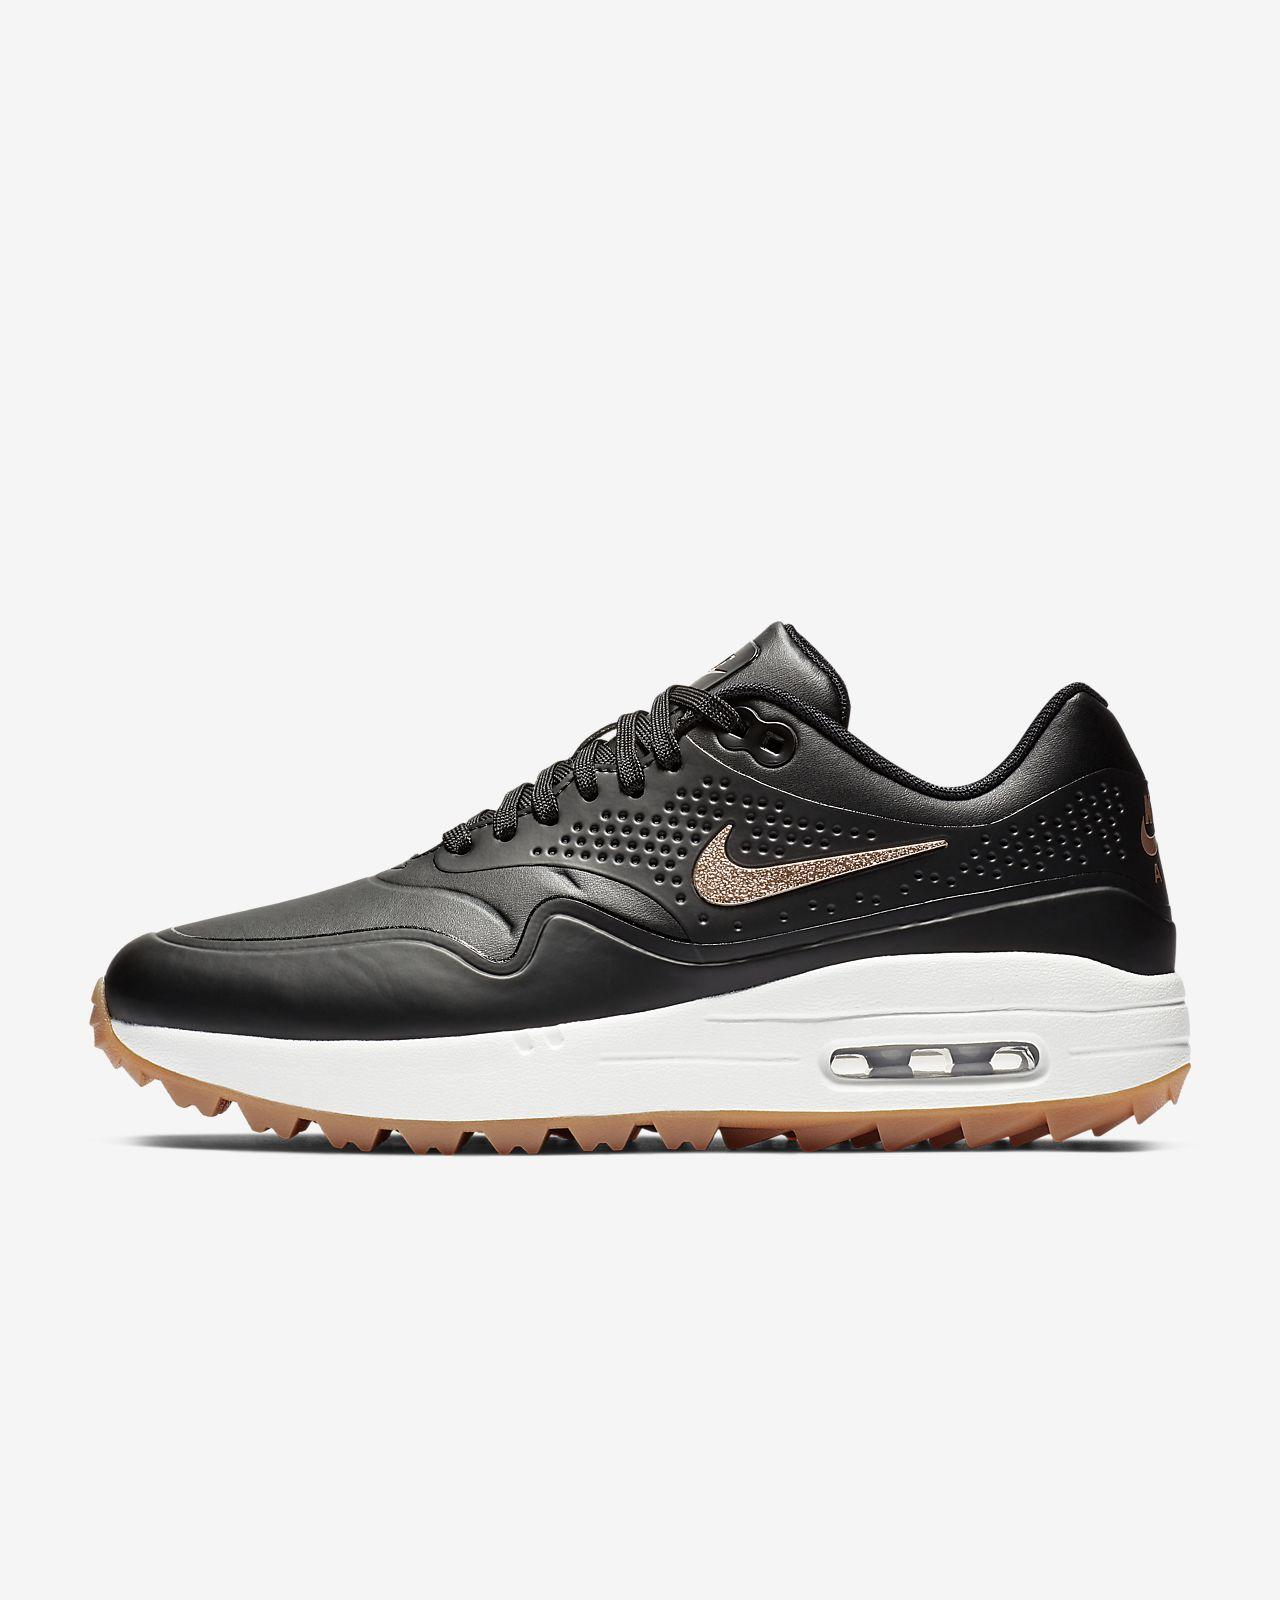 online retailer 4942c 6cb19 Chaussure de golf Nike Air Max 1 G pour Femme ...